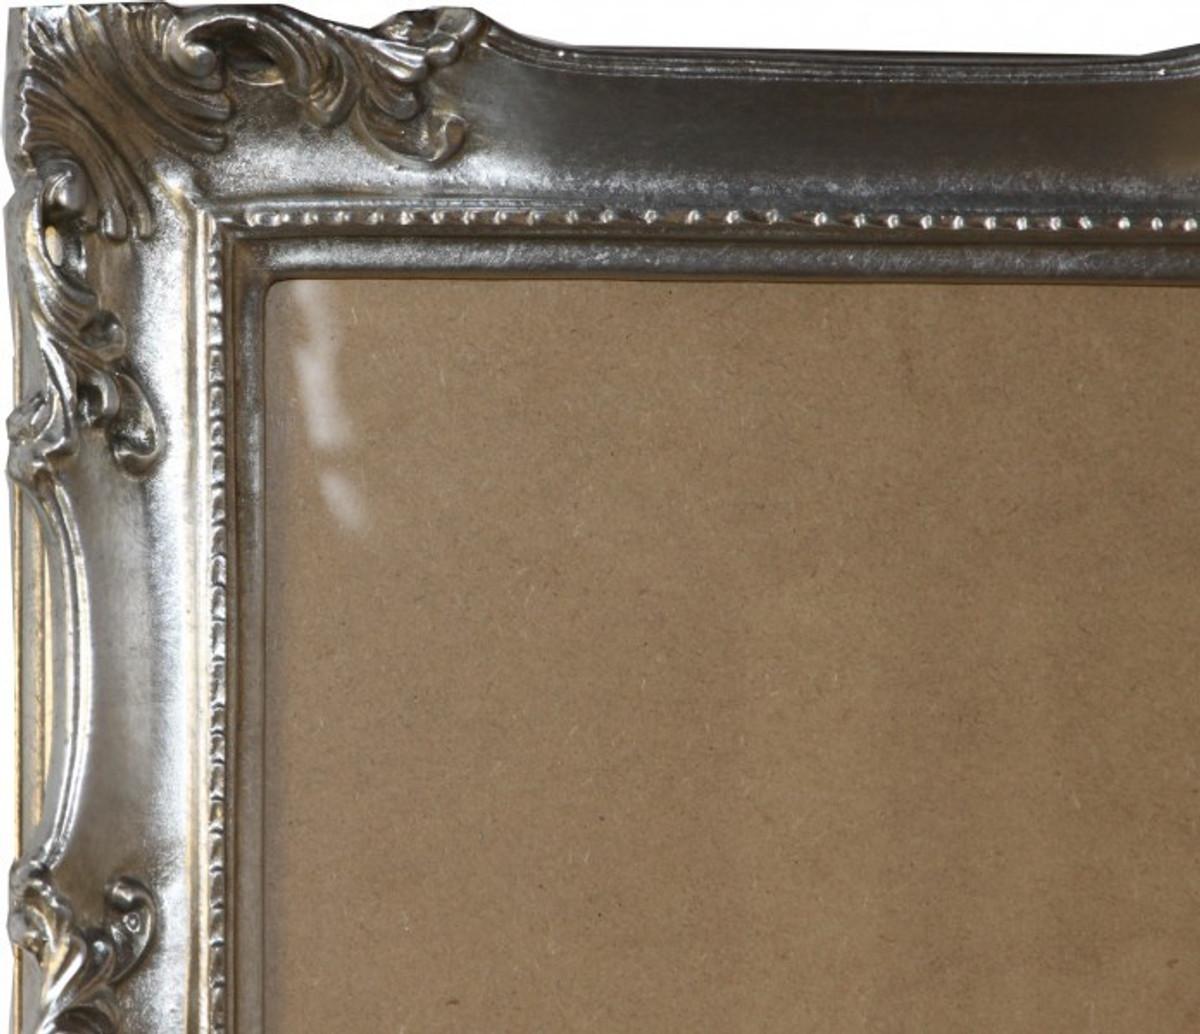 casa padrino barock holz bilderrahmen 144 x 84 cm silber gro er bilder rahmen foto rahmen. Black Bedroom Furniture Sets. Home Design Ideas